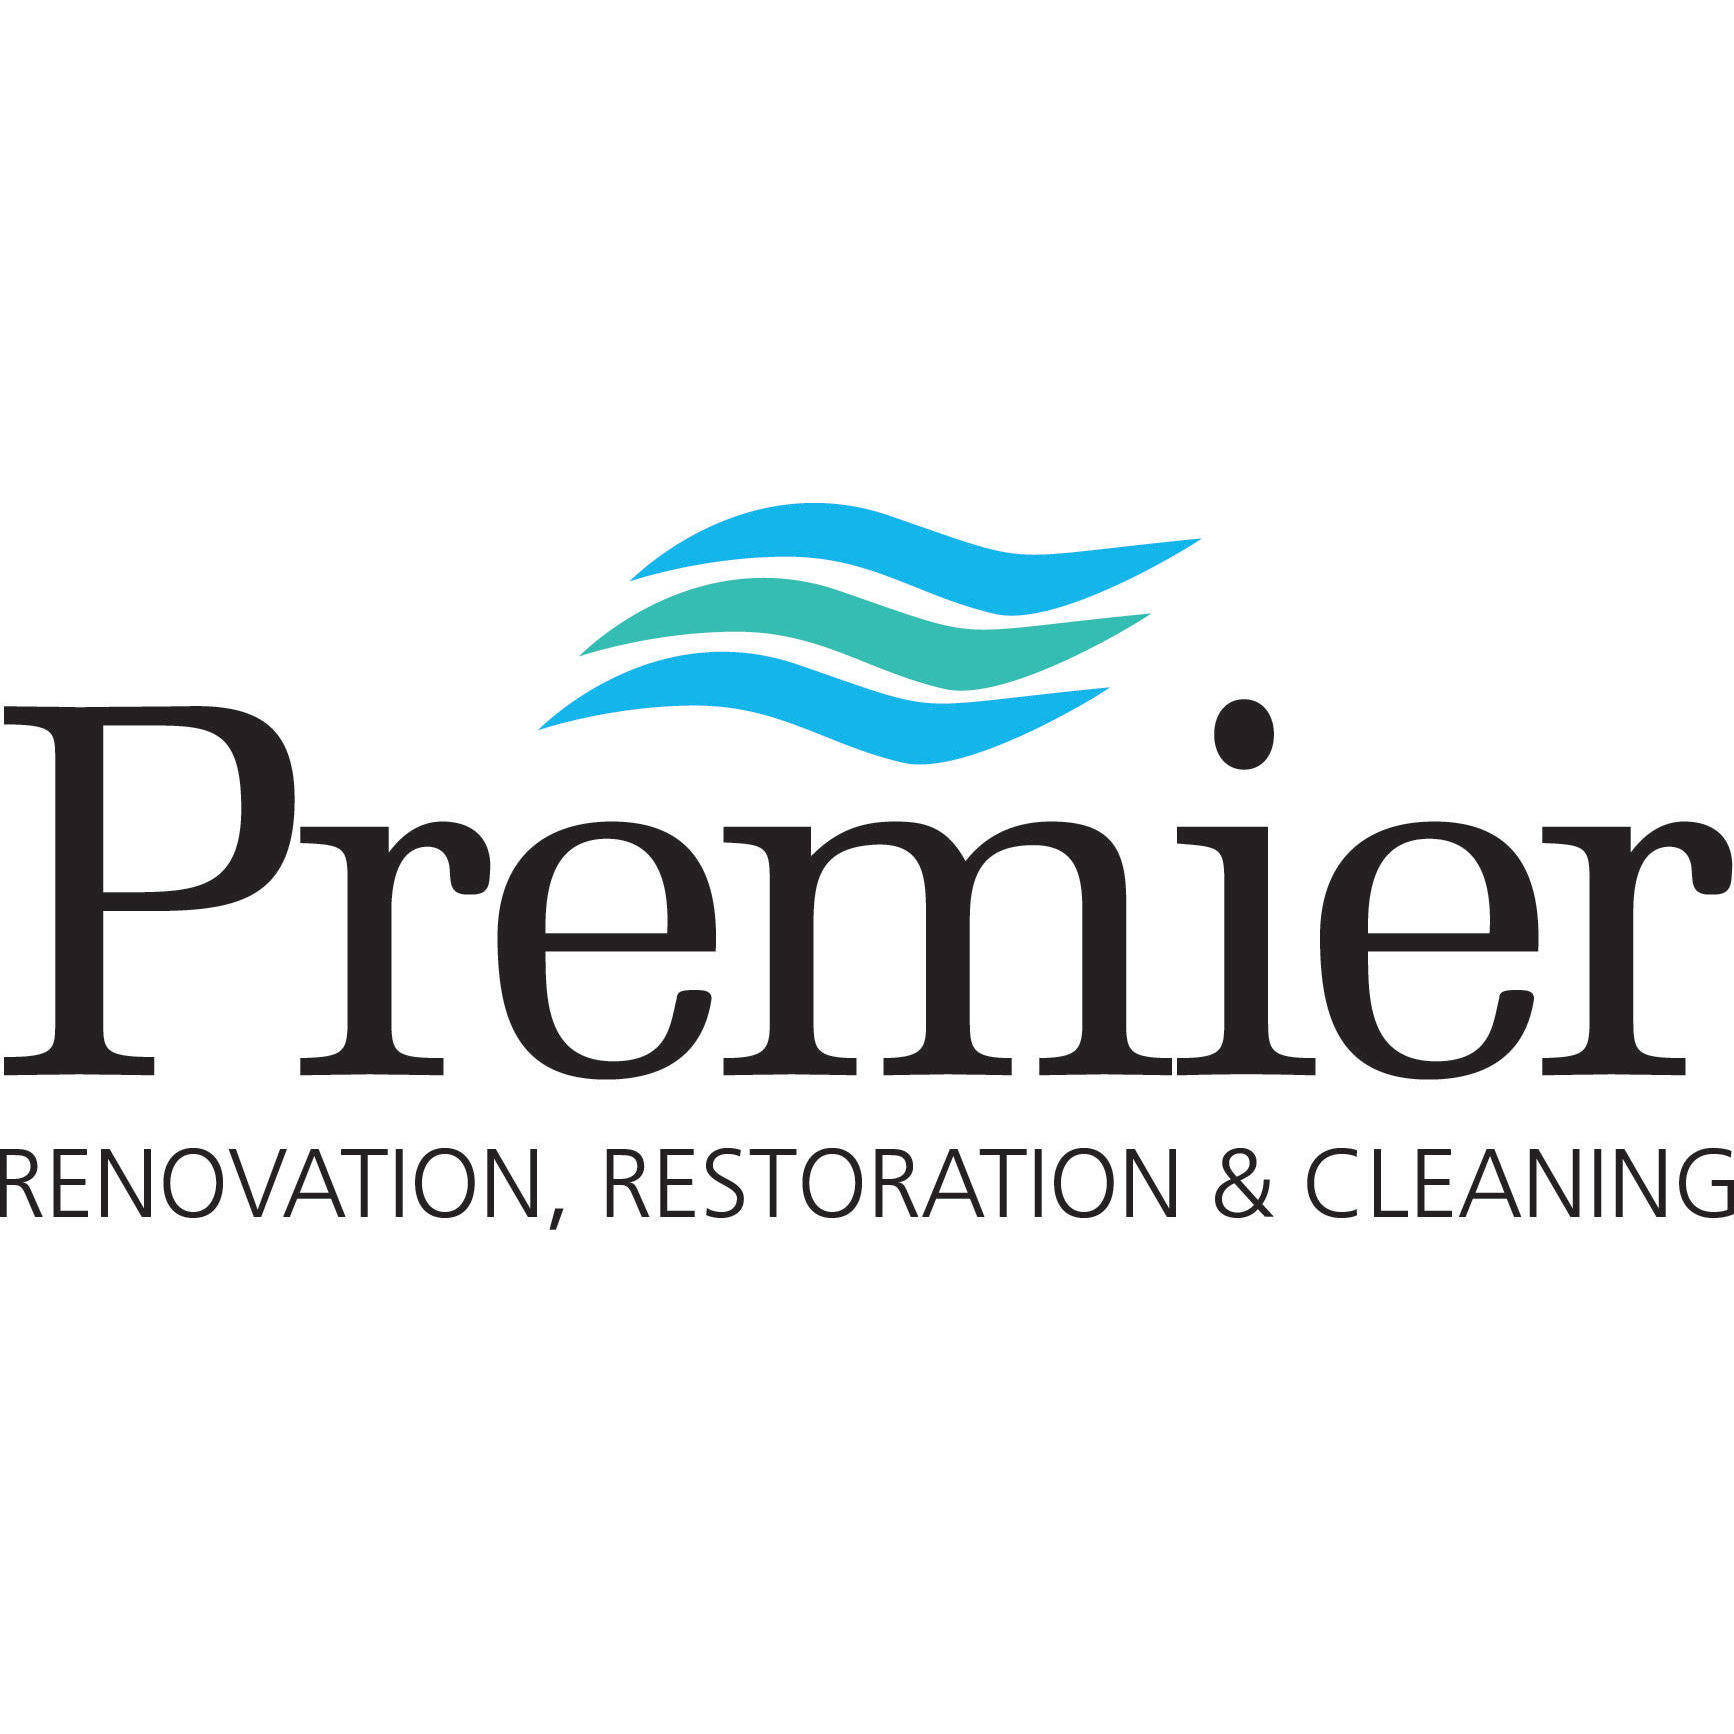 Premier Renovation Restoration & Cleaning